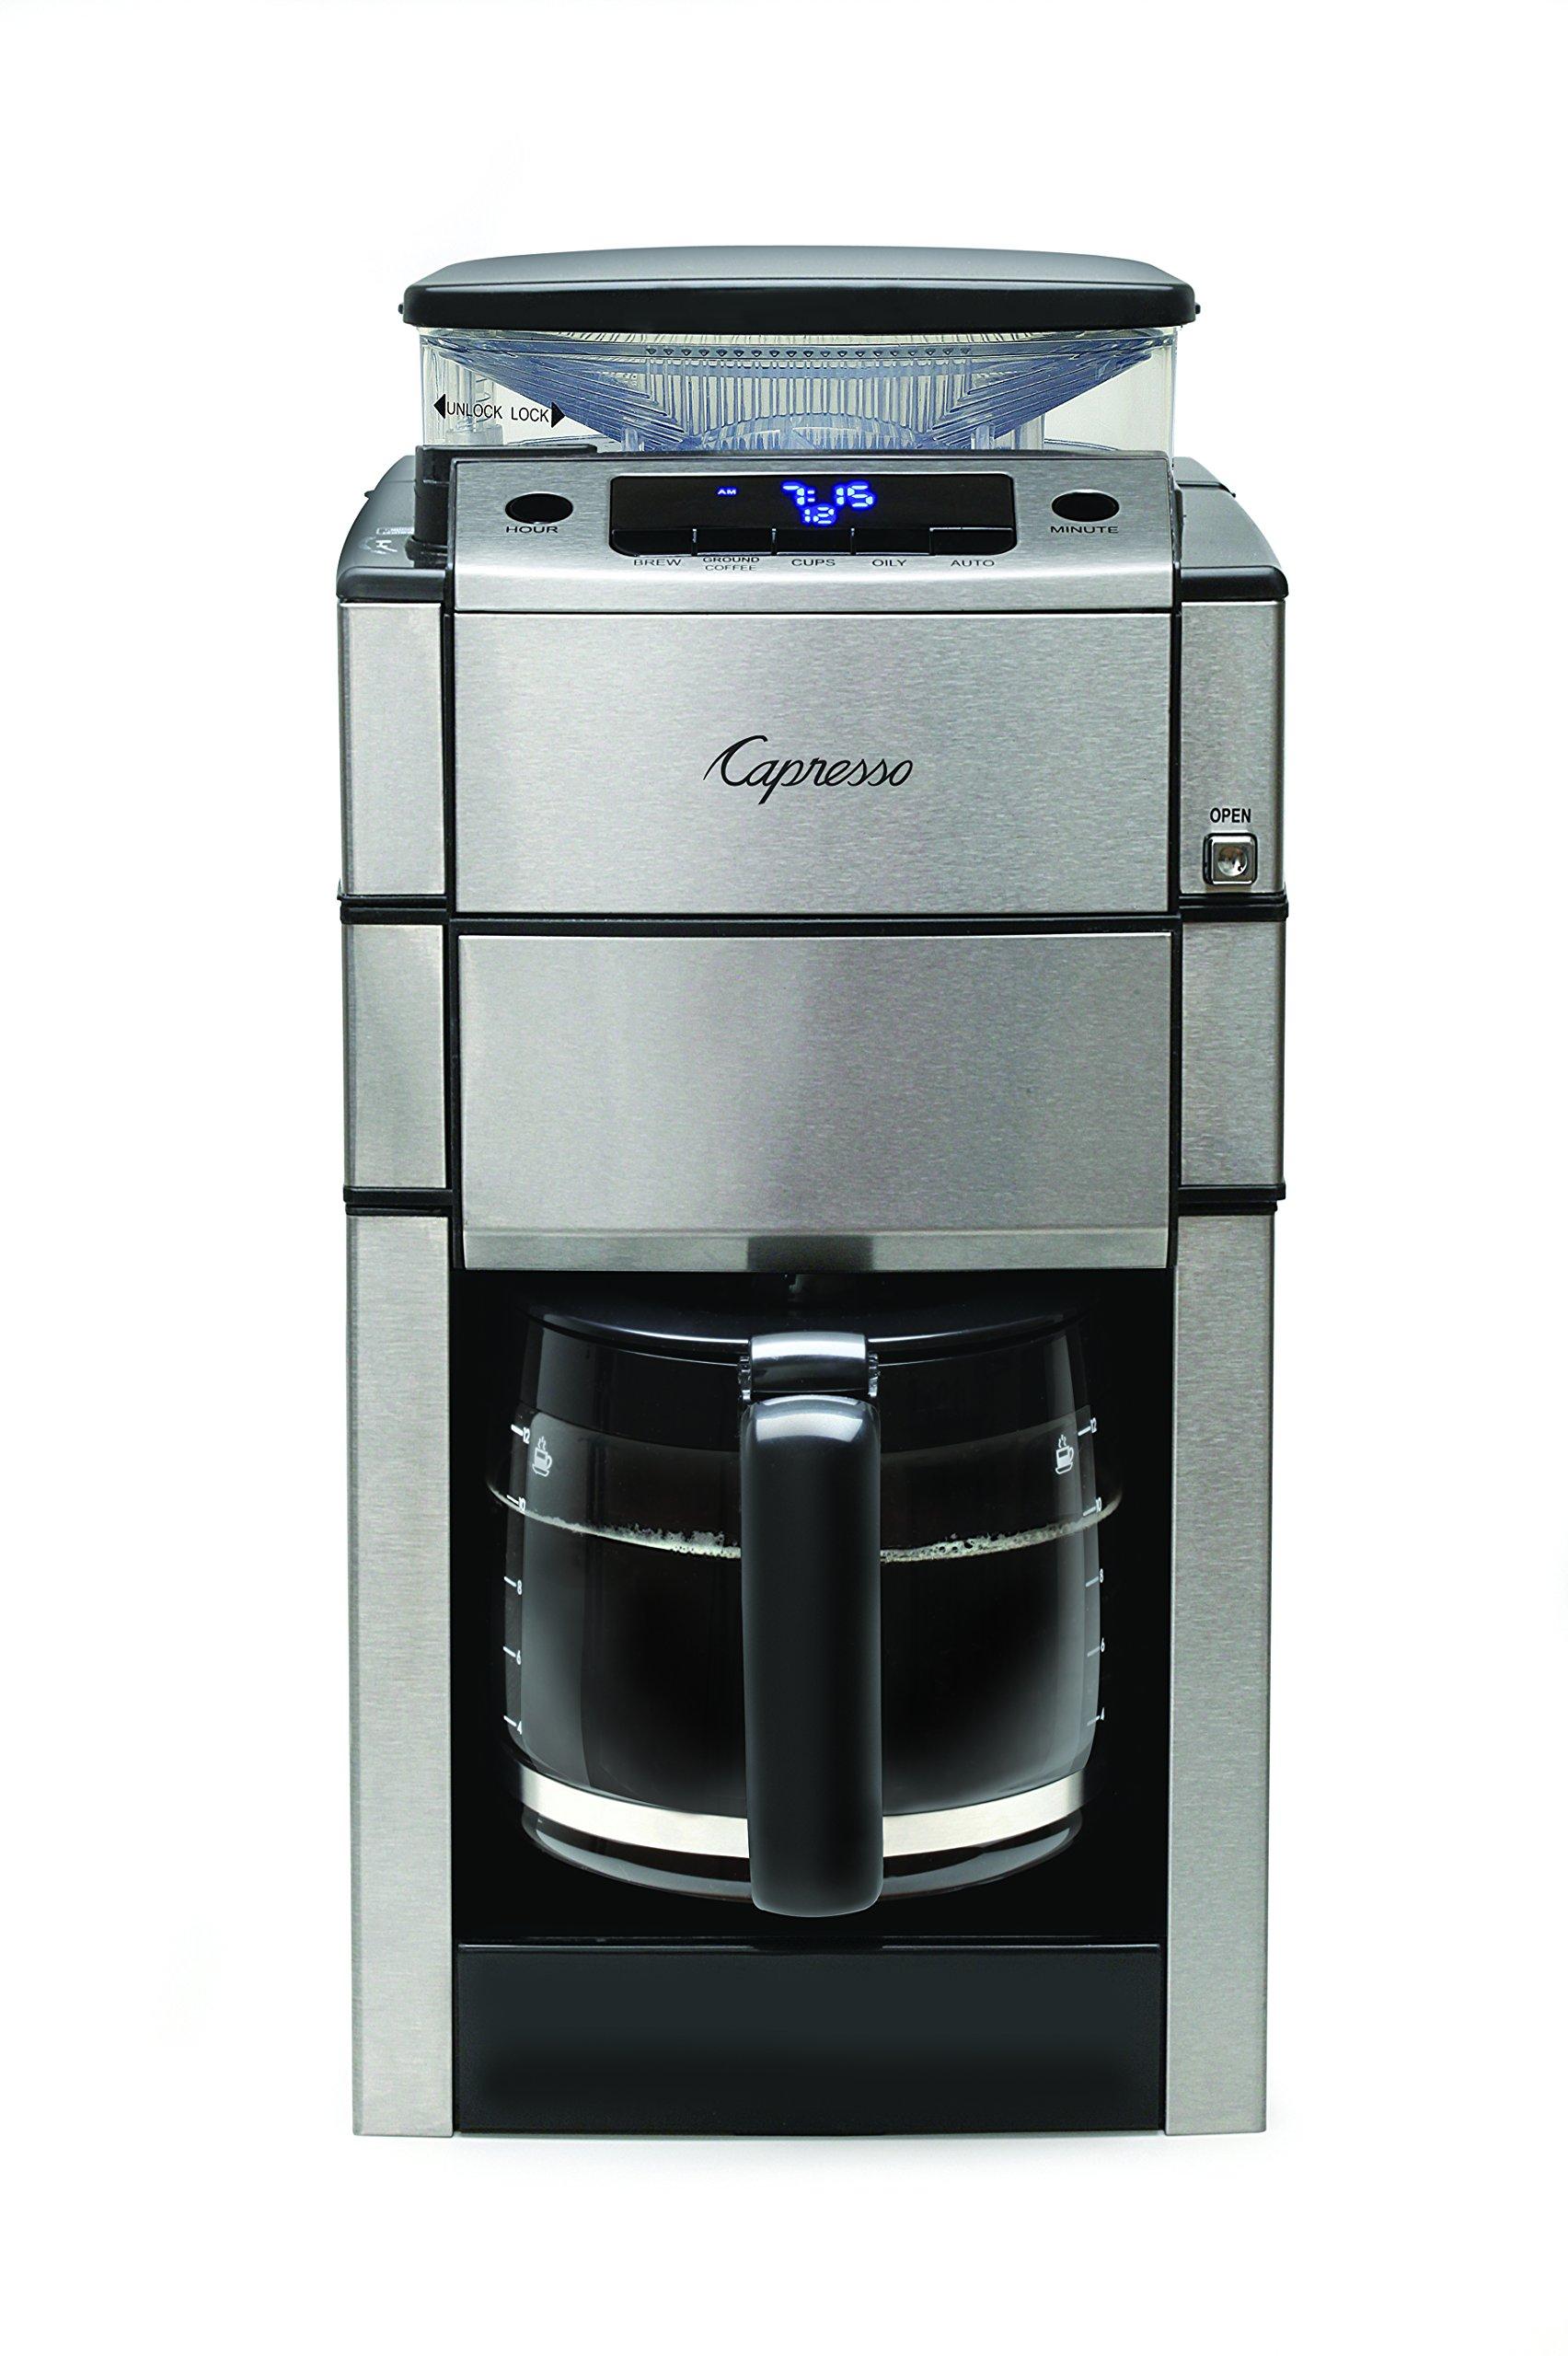 Capresso 487.05 Equipo Pro Plus Cristal Jarra cafetera eléctrica, Plata: Amazon.es: Hogar